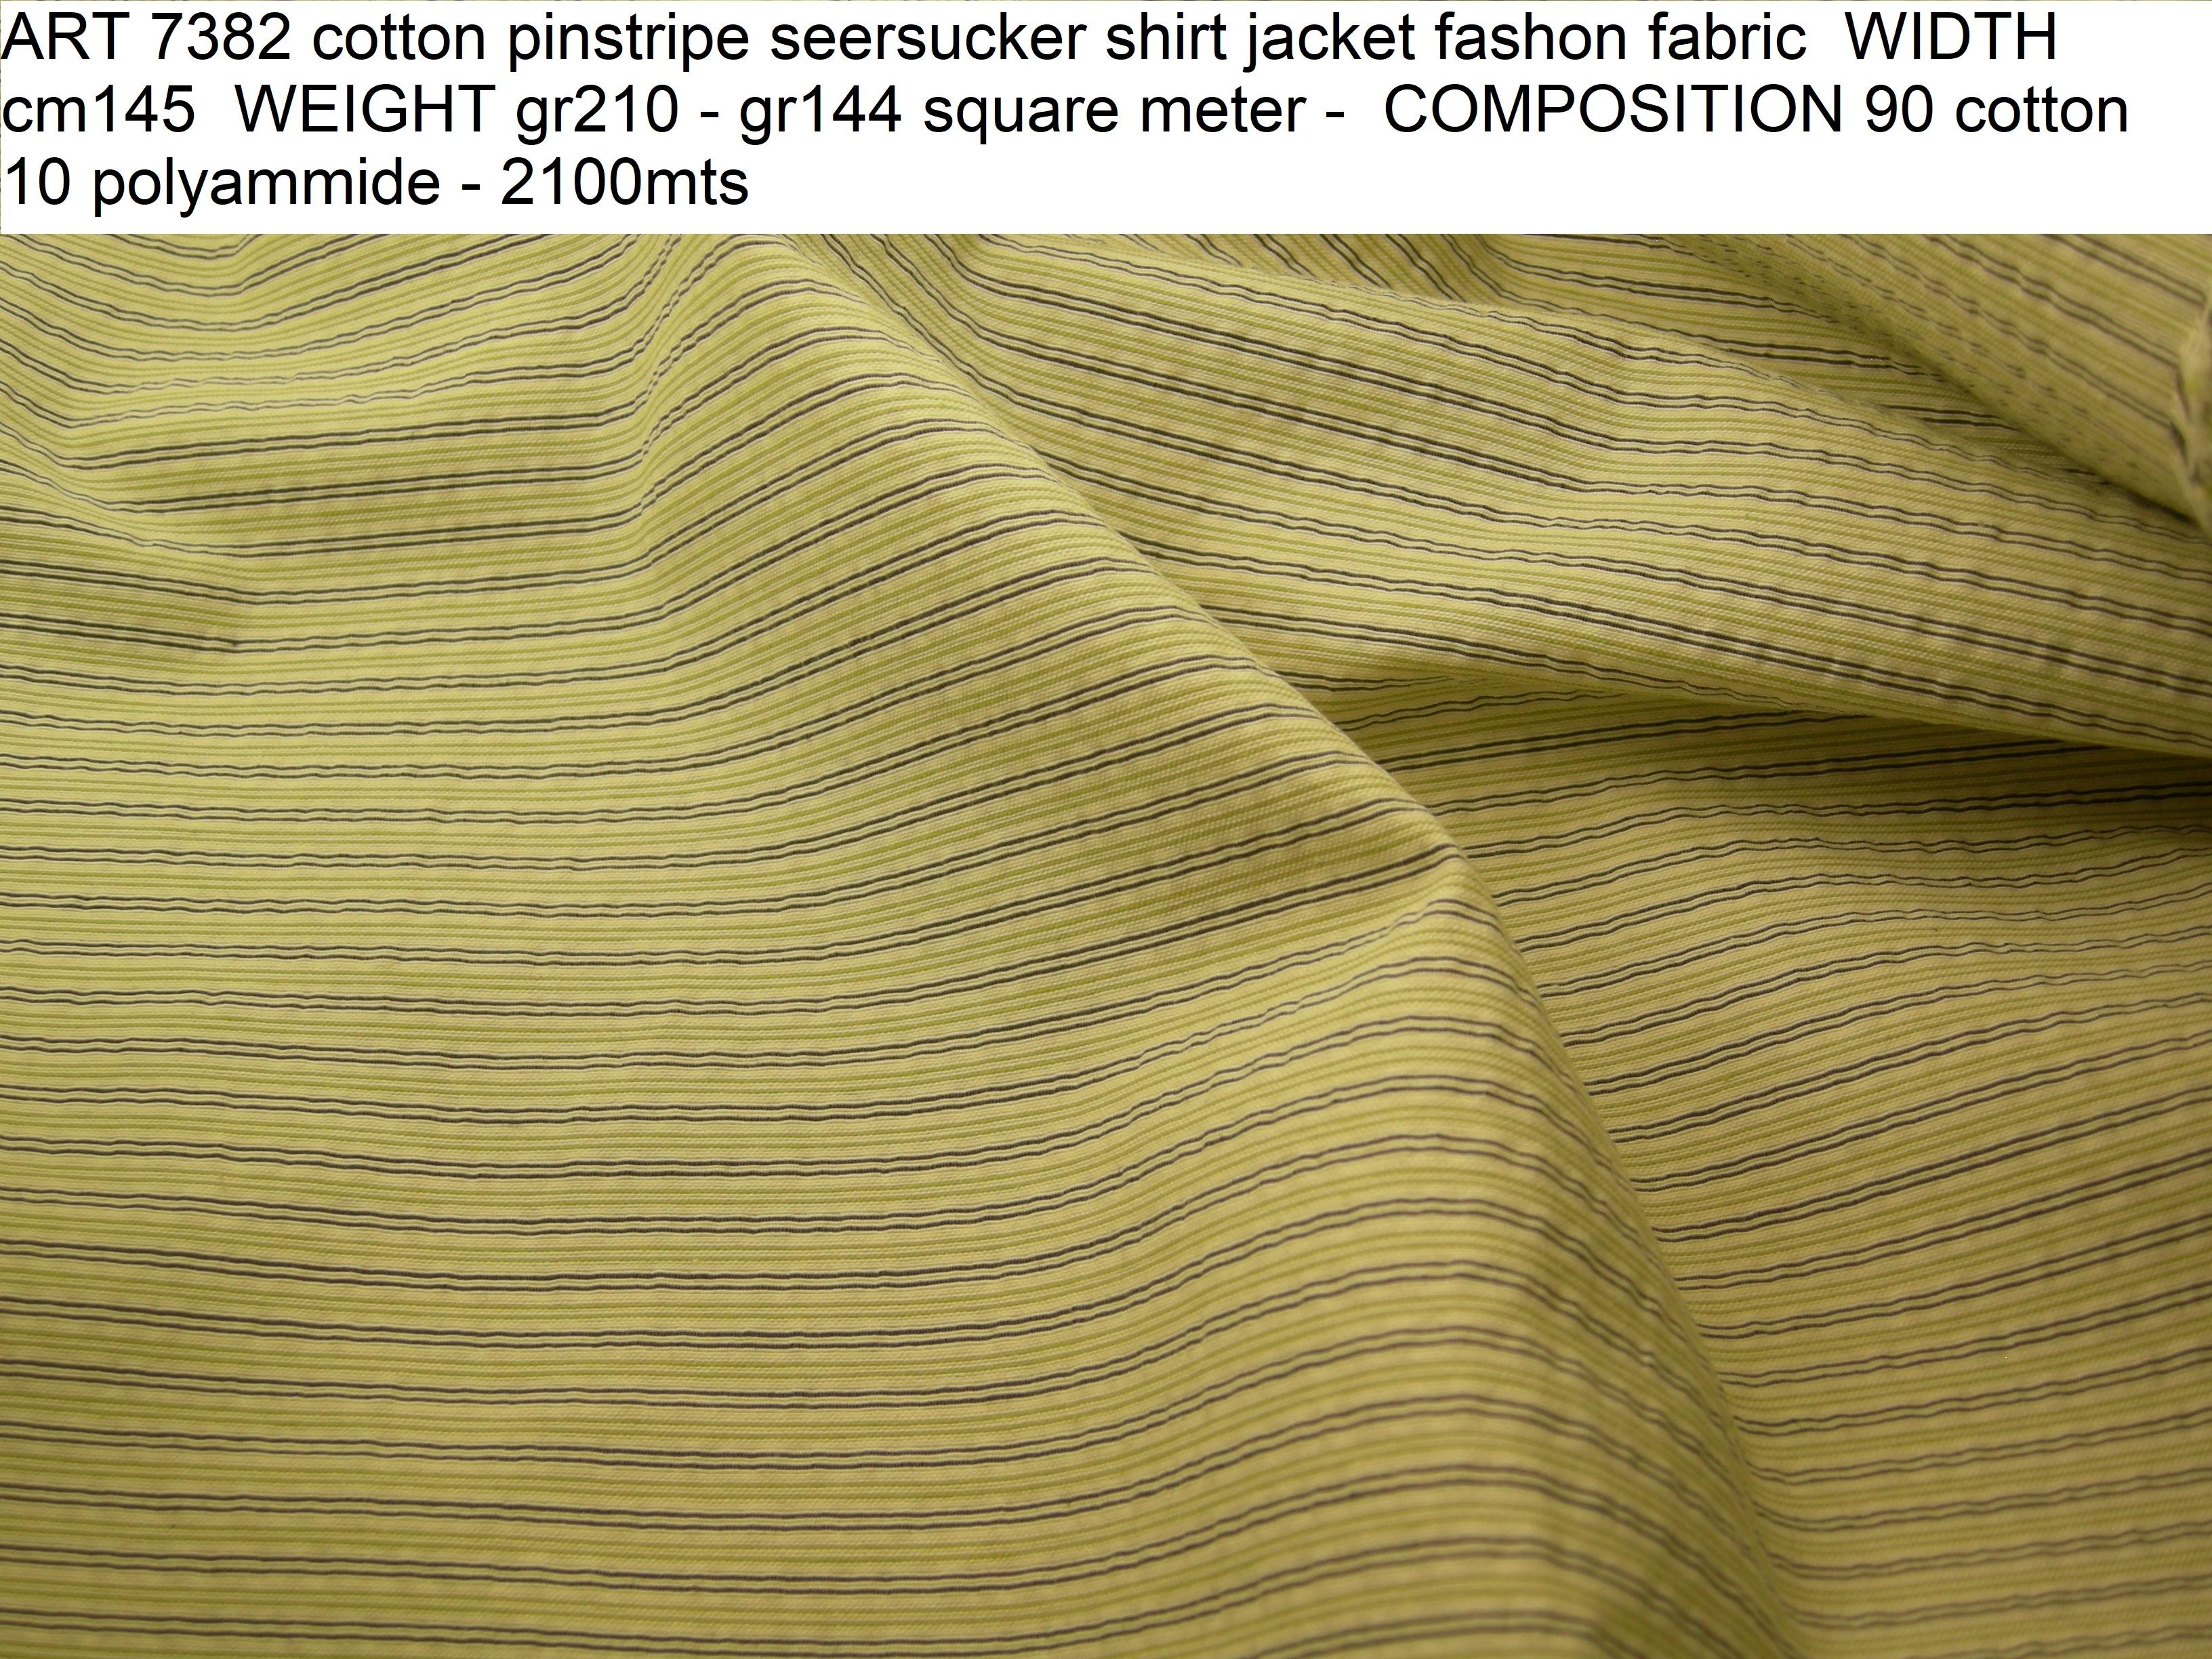 ART 7382 cotton pinstripe seersucker shirt jacket fashon fabric WIDTH cm145 WEIGHT gr210 - gr144 square meter - COMPOSITION 90 cotton 10 polyammide - 2100mts